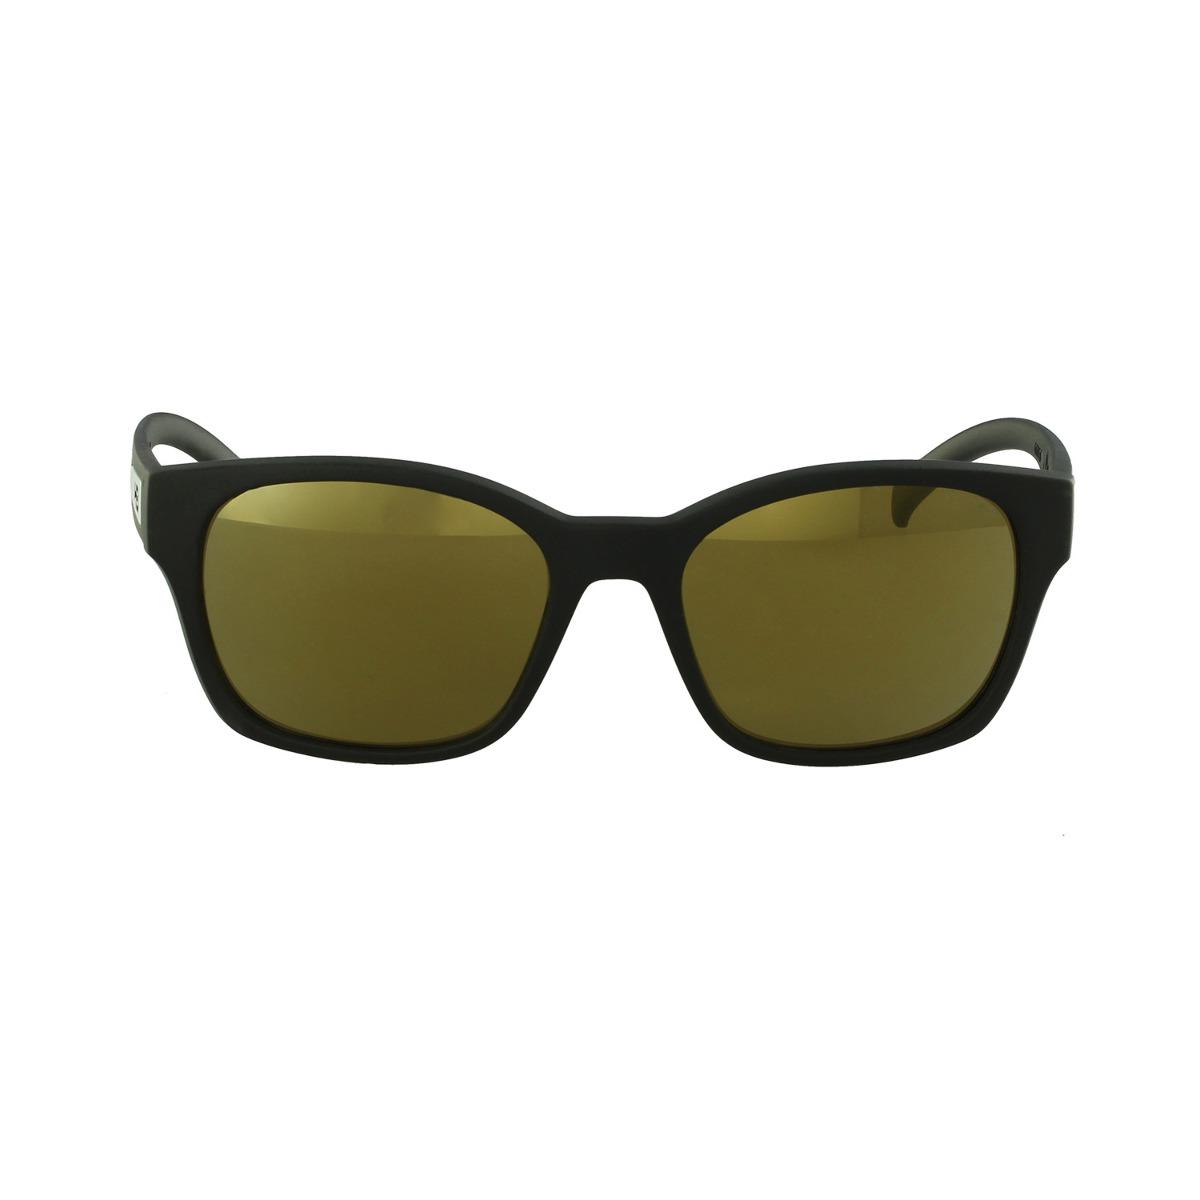 Óculos De Sol Hot Buttered Casual Preto - R  230,00 em Mercado Livre af821a75ef